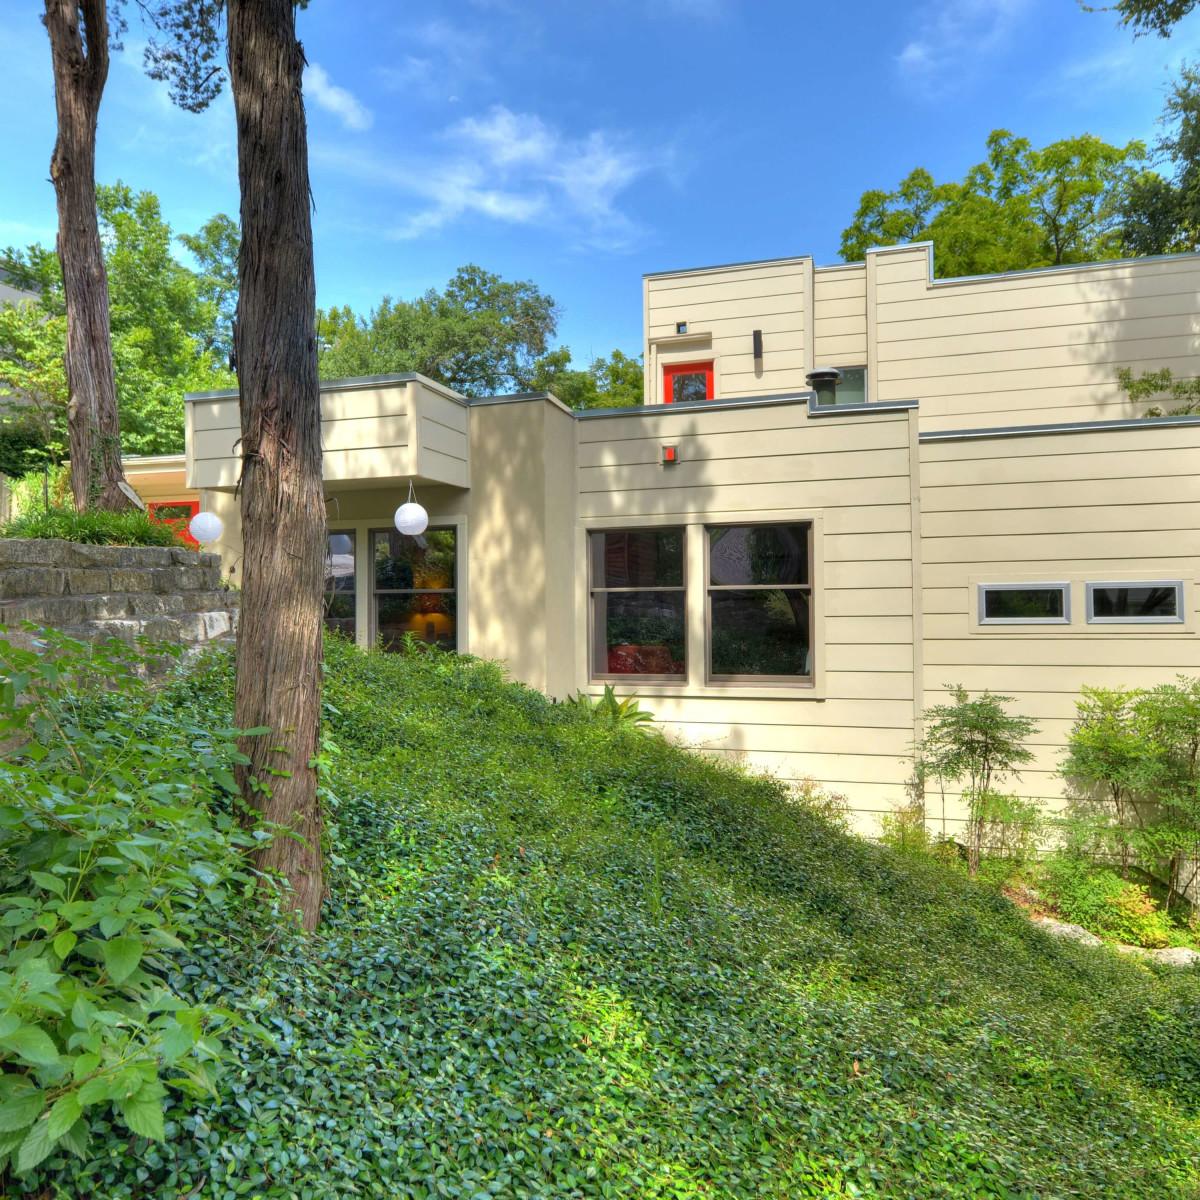 Austin home house 5932 Highland Hills Dr 78731 exterior side hill